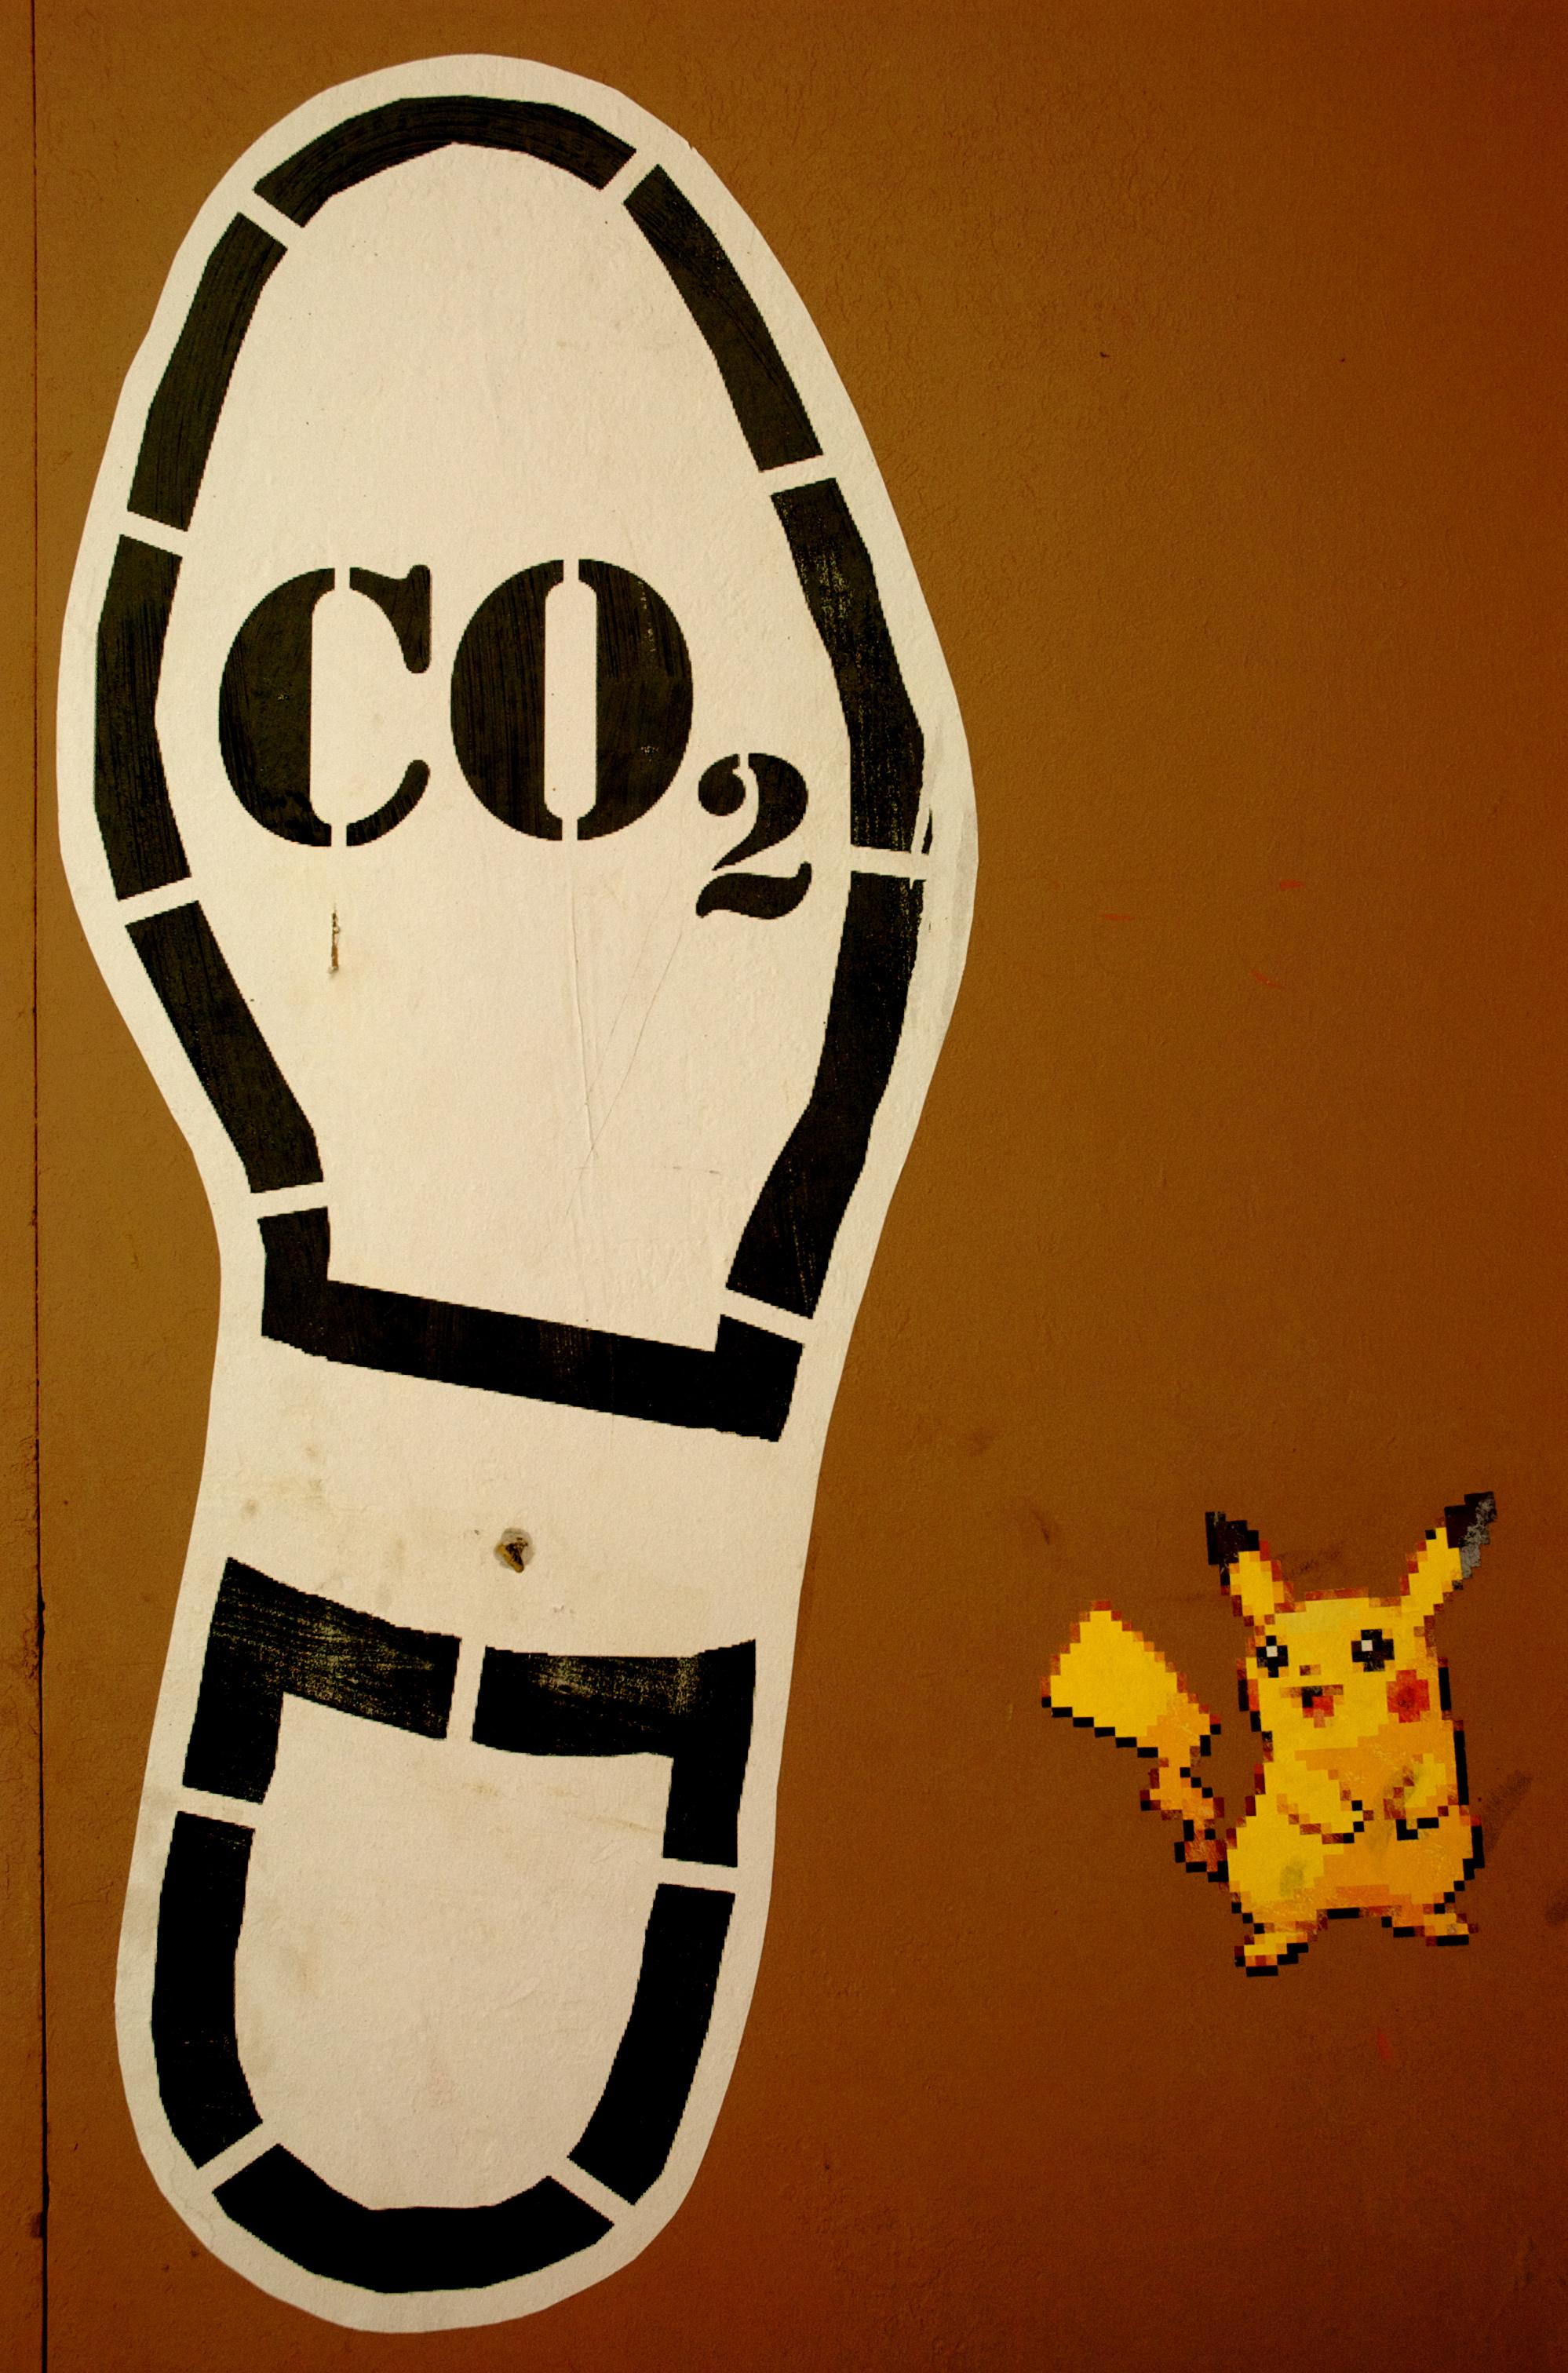 How Big Is Your Digital Carbon Footprint